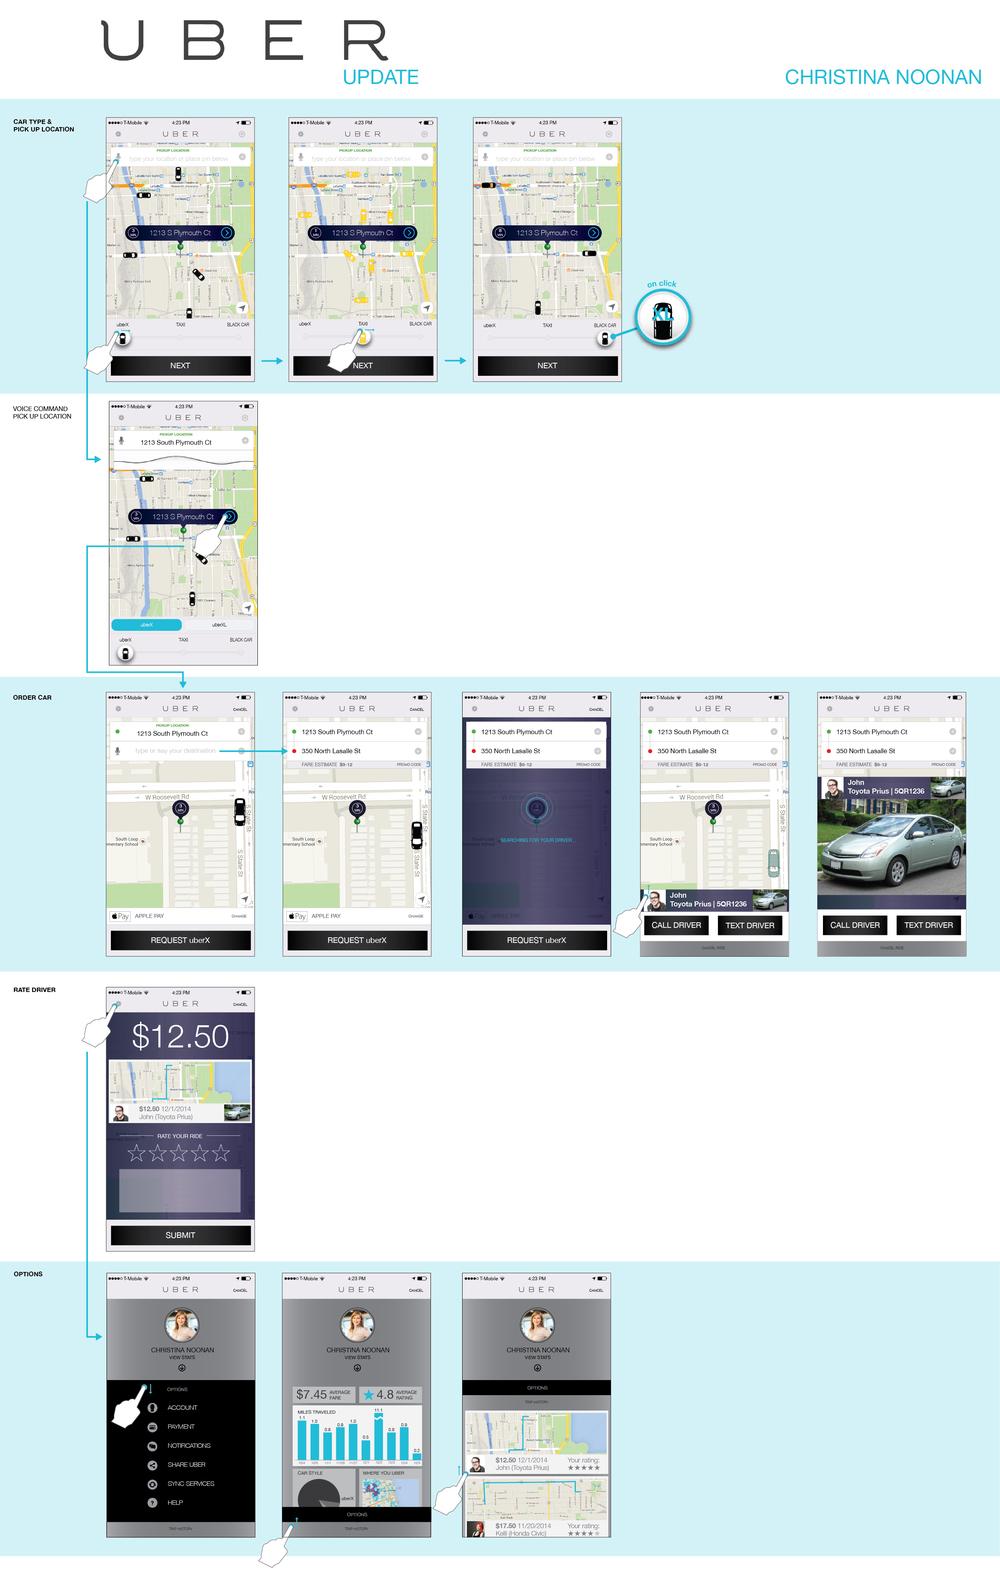 Uber_Update_Wireframe.jpg